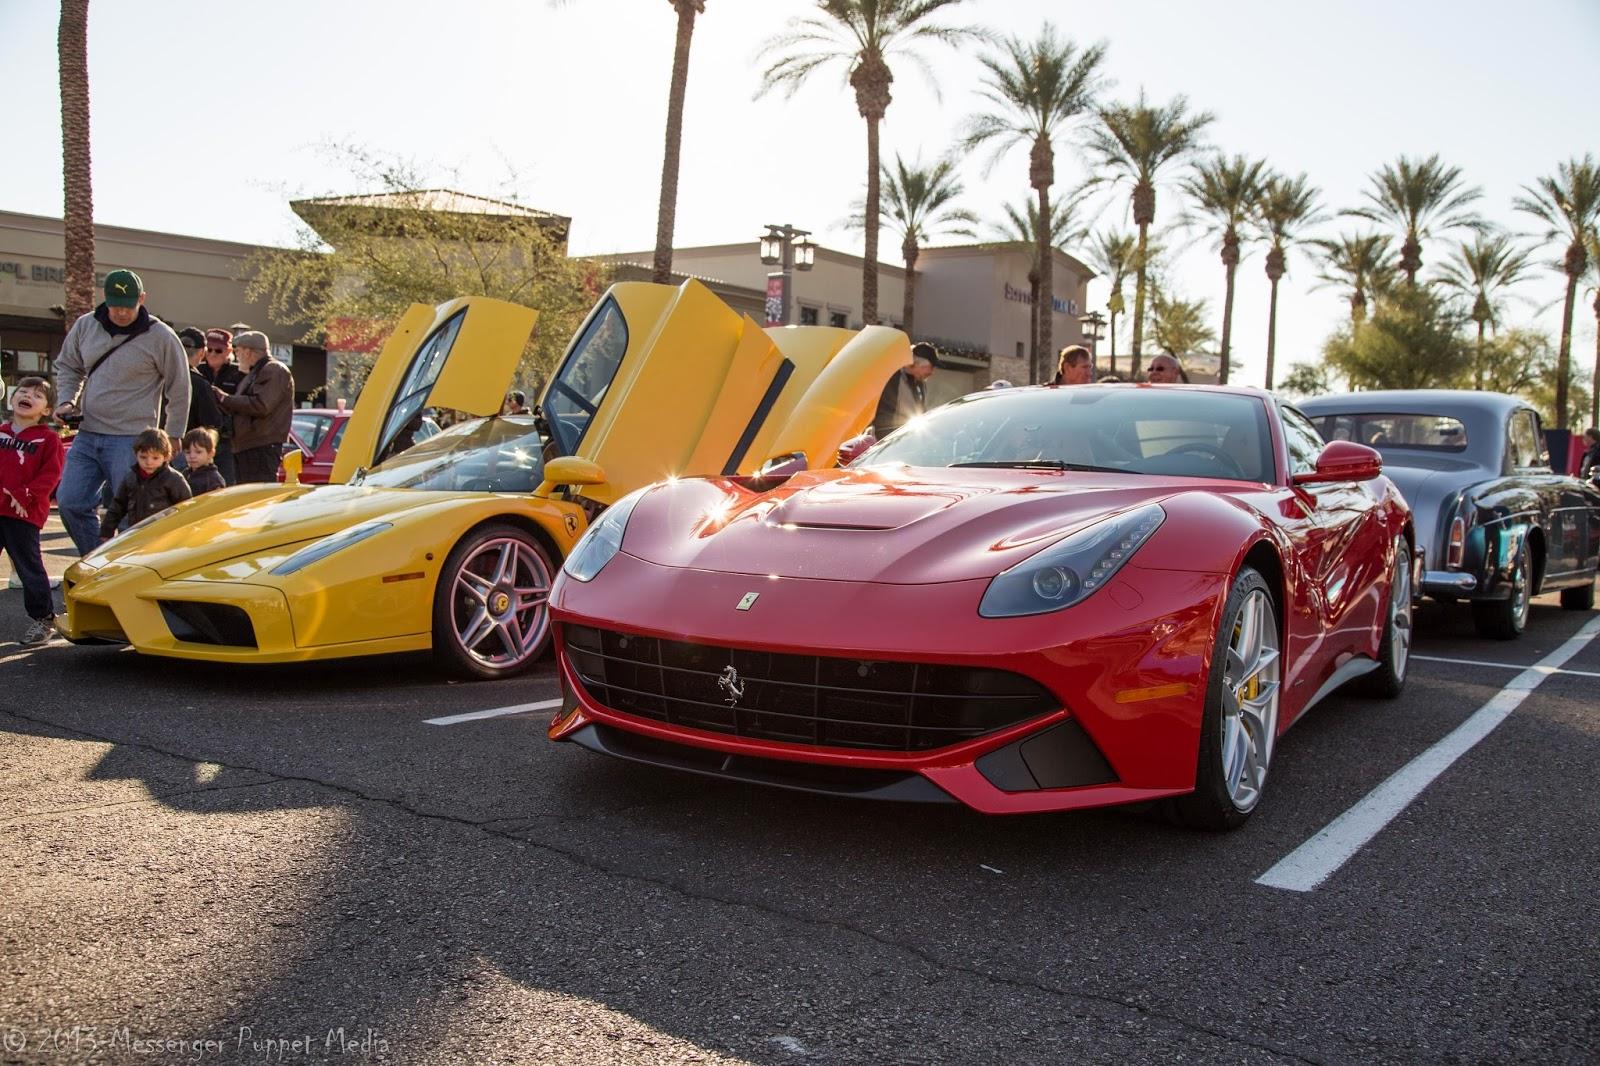 Ferrari F12berlinetta Enzo